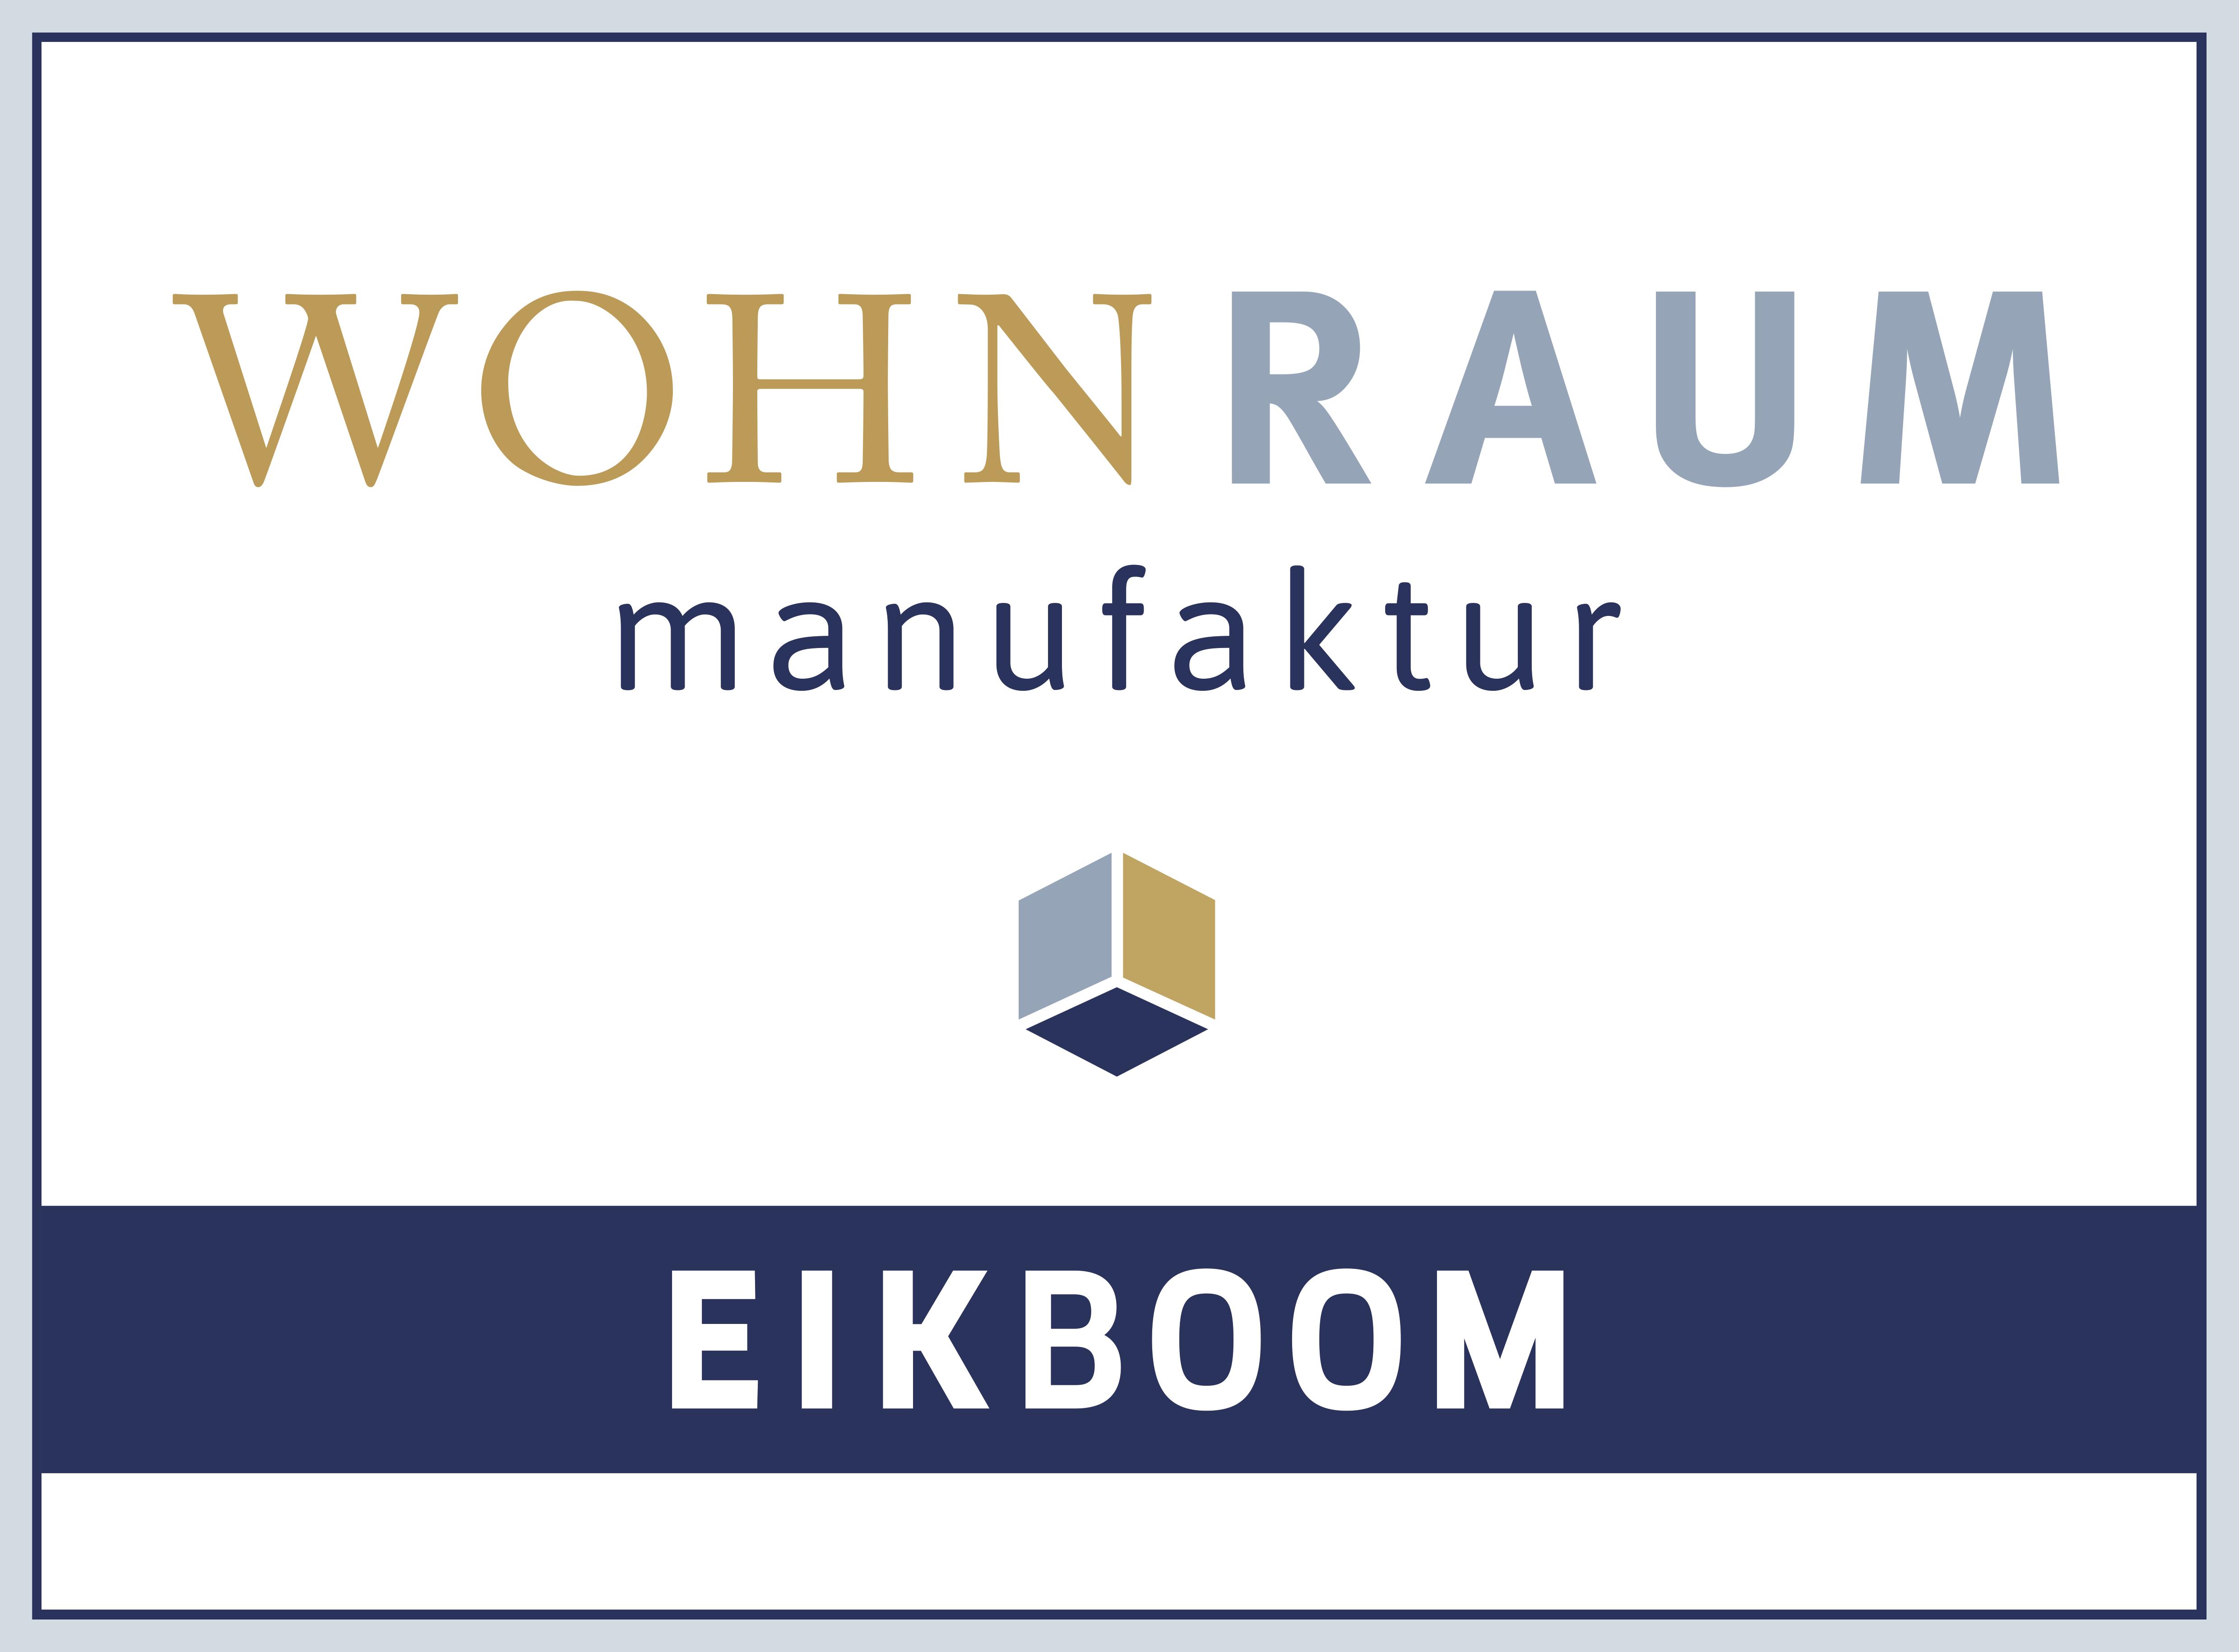 WohnRaum-Manufaktur EIKBOOM